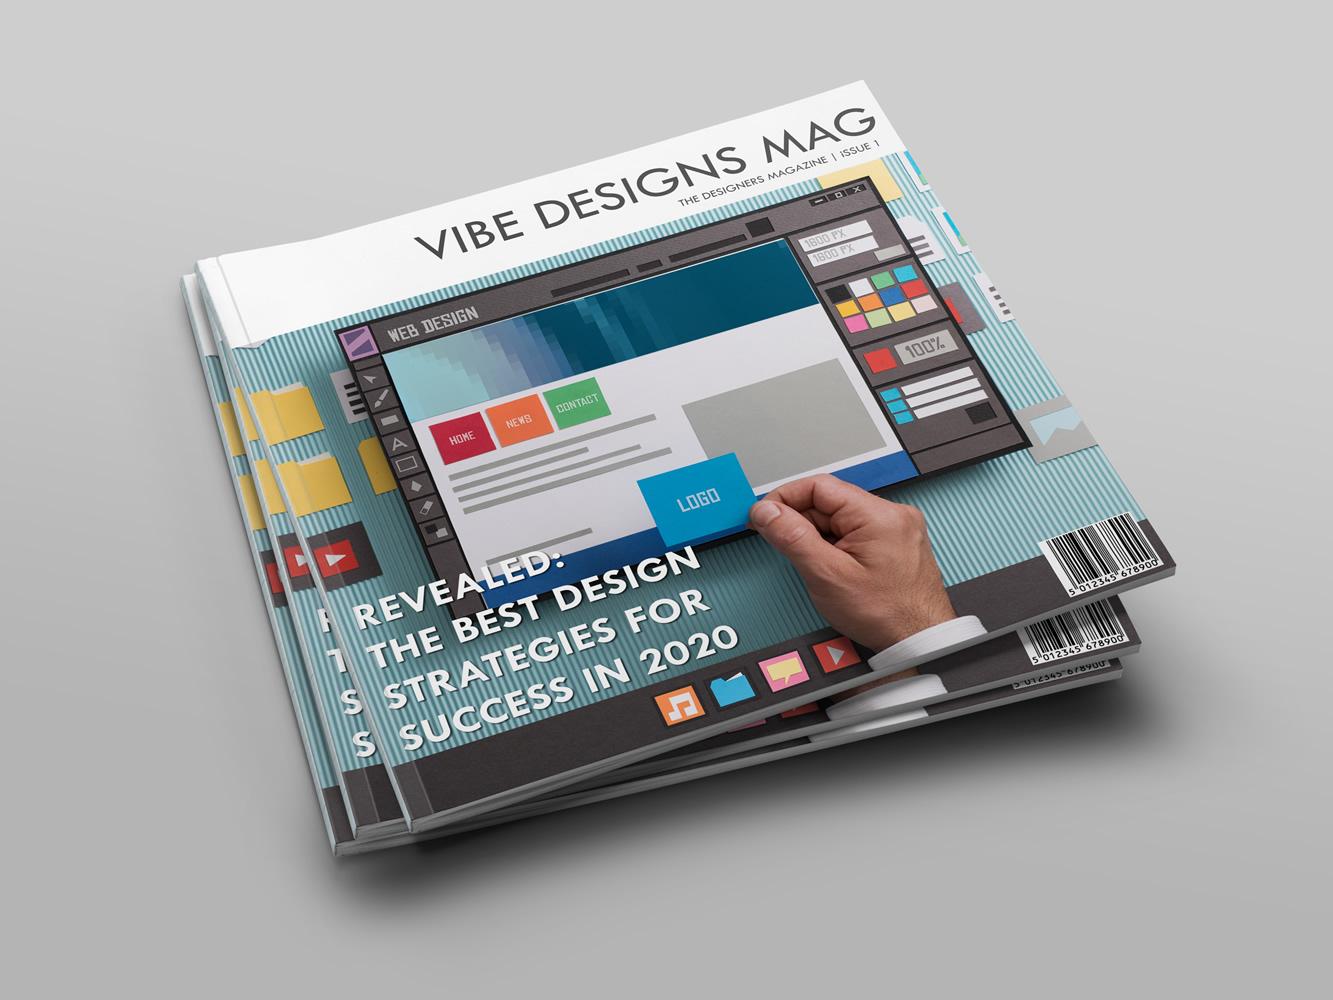 Vibe Designs Magazine